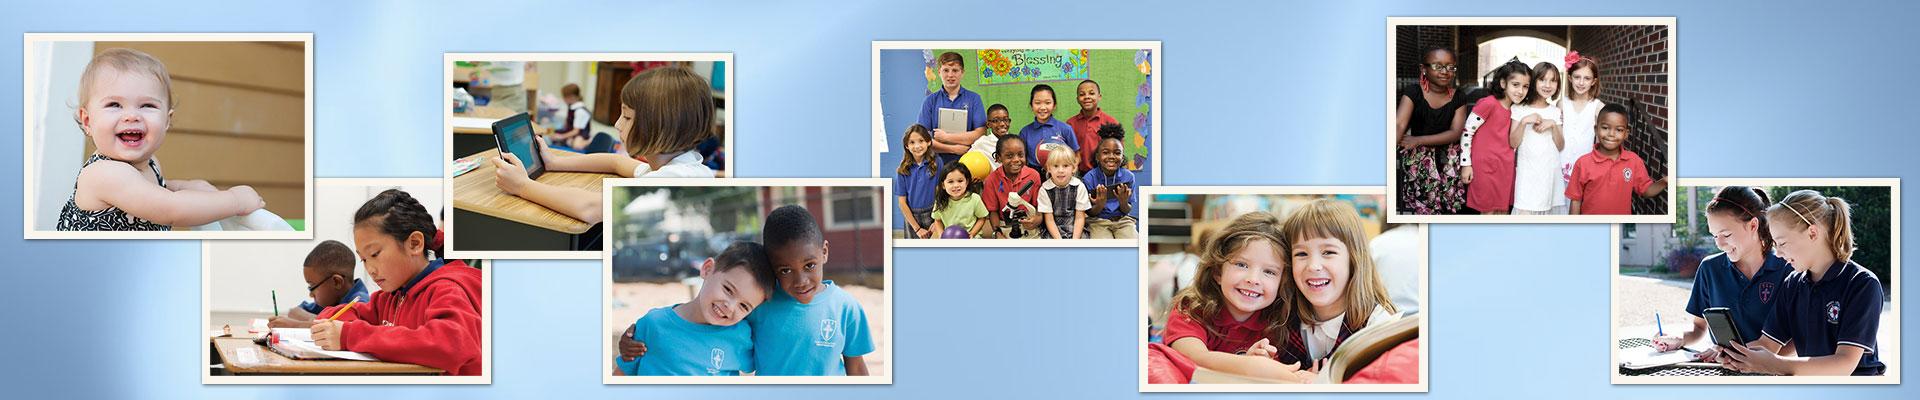 header-image-Trinity-Lutheran-School